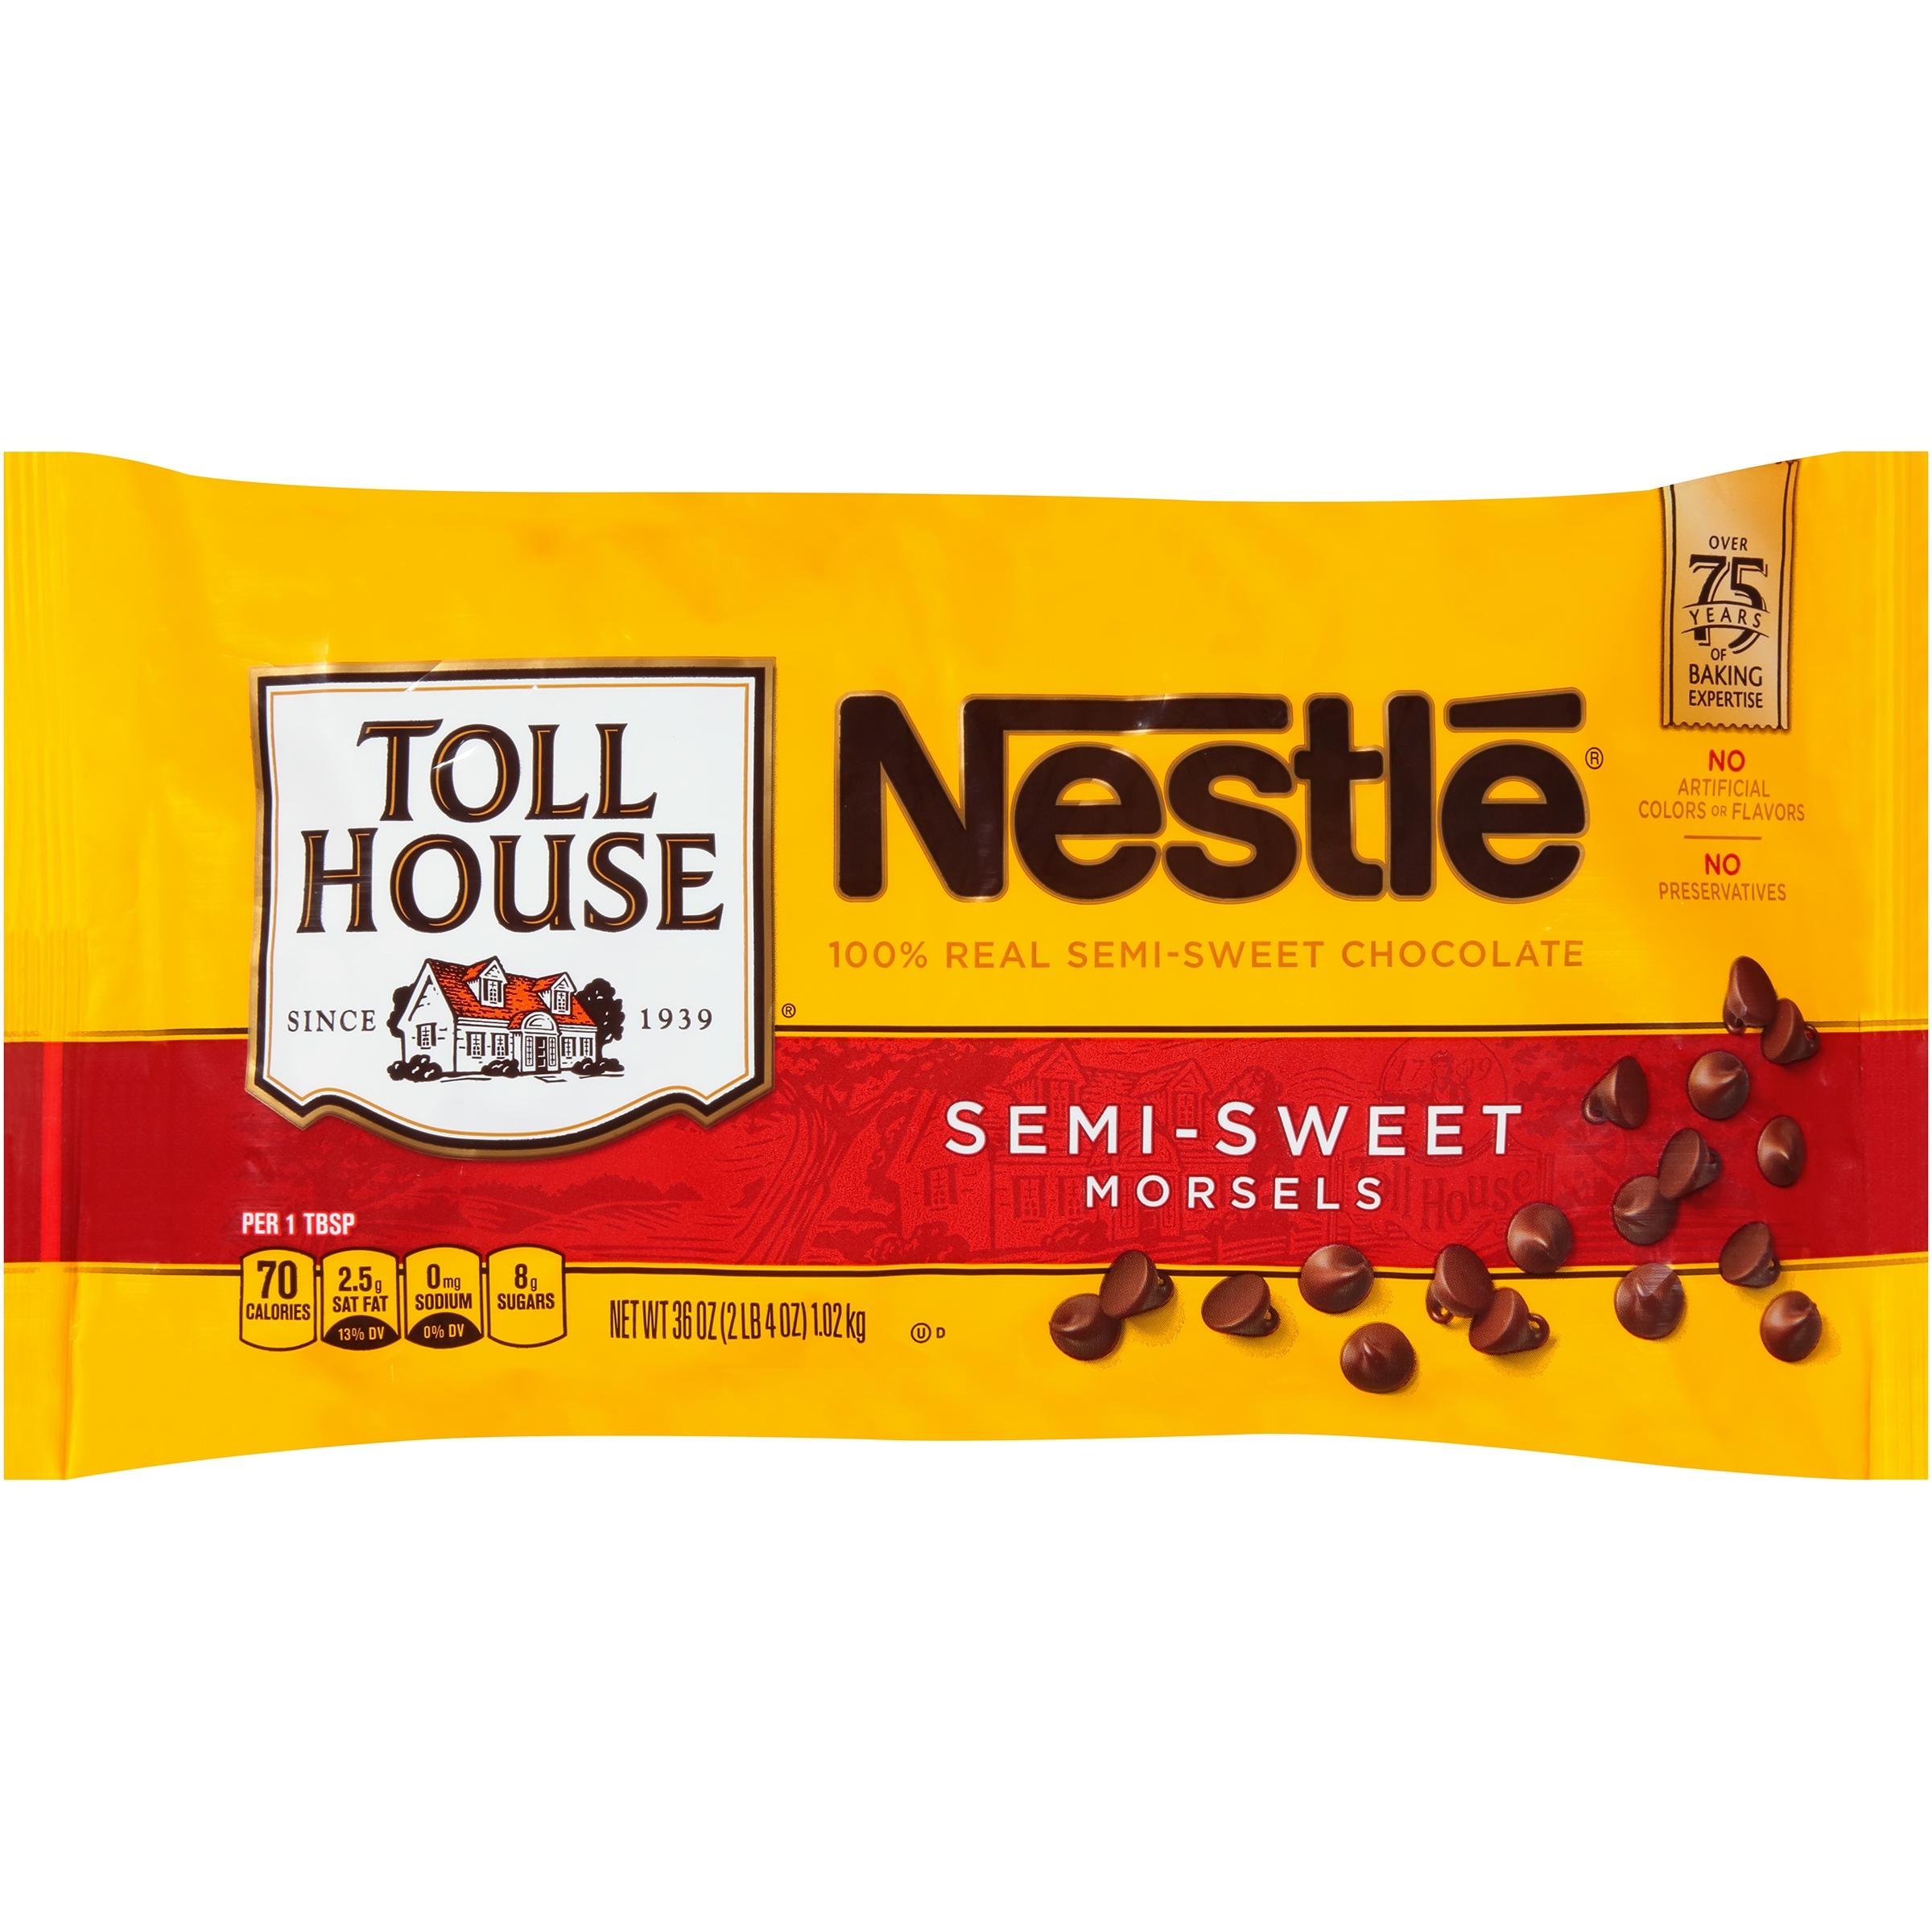 Nestlé TOLL HOUSE Semi-Sweet Chocolate Morsels 36 oz. Bag